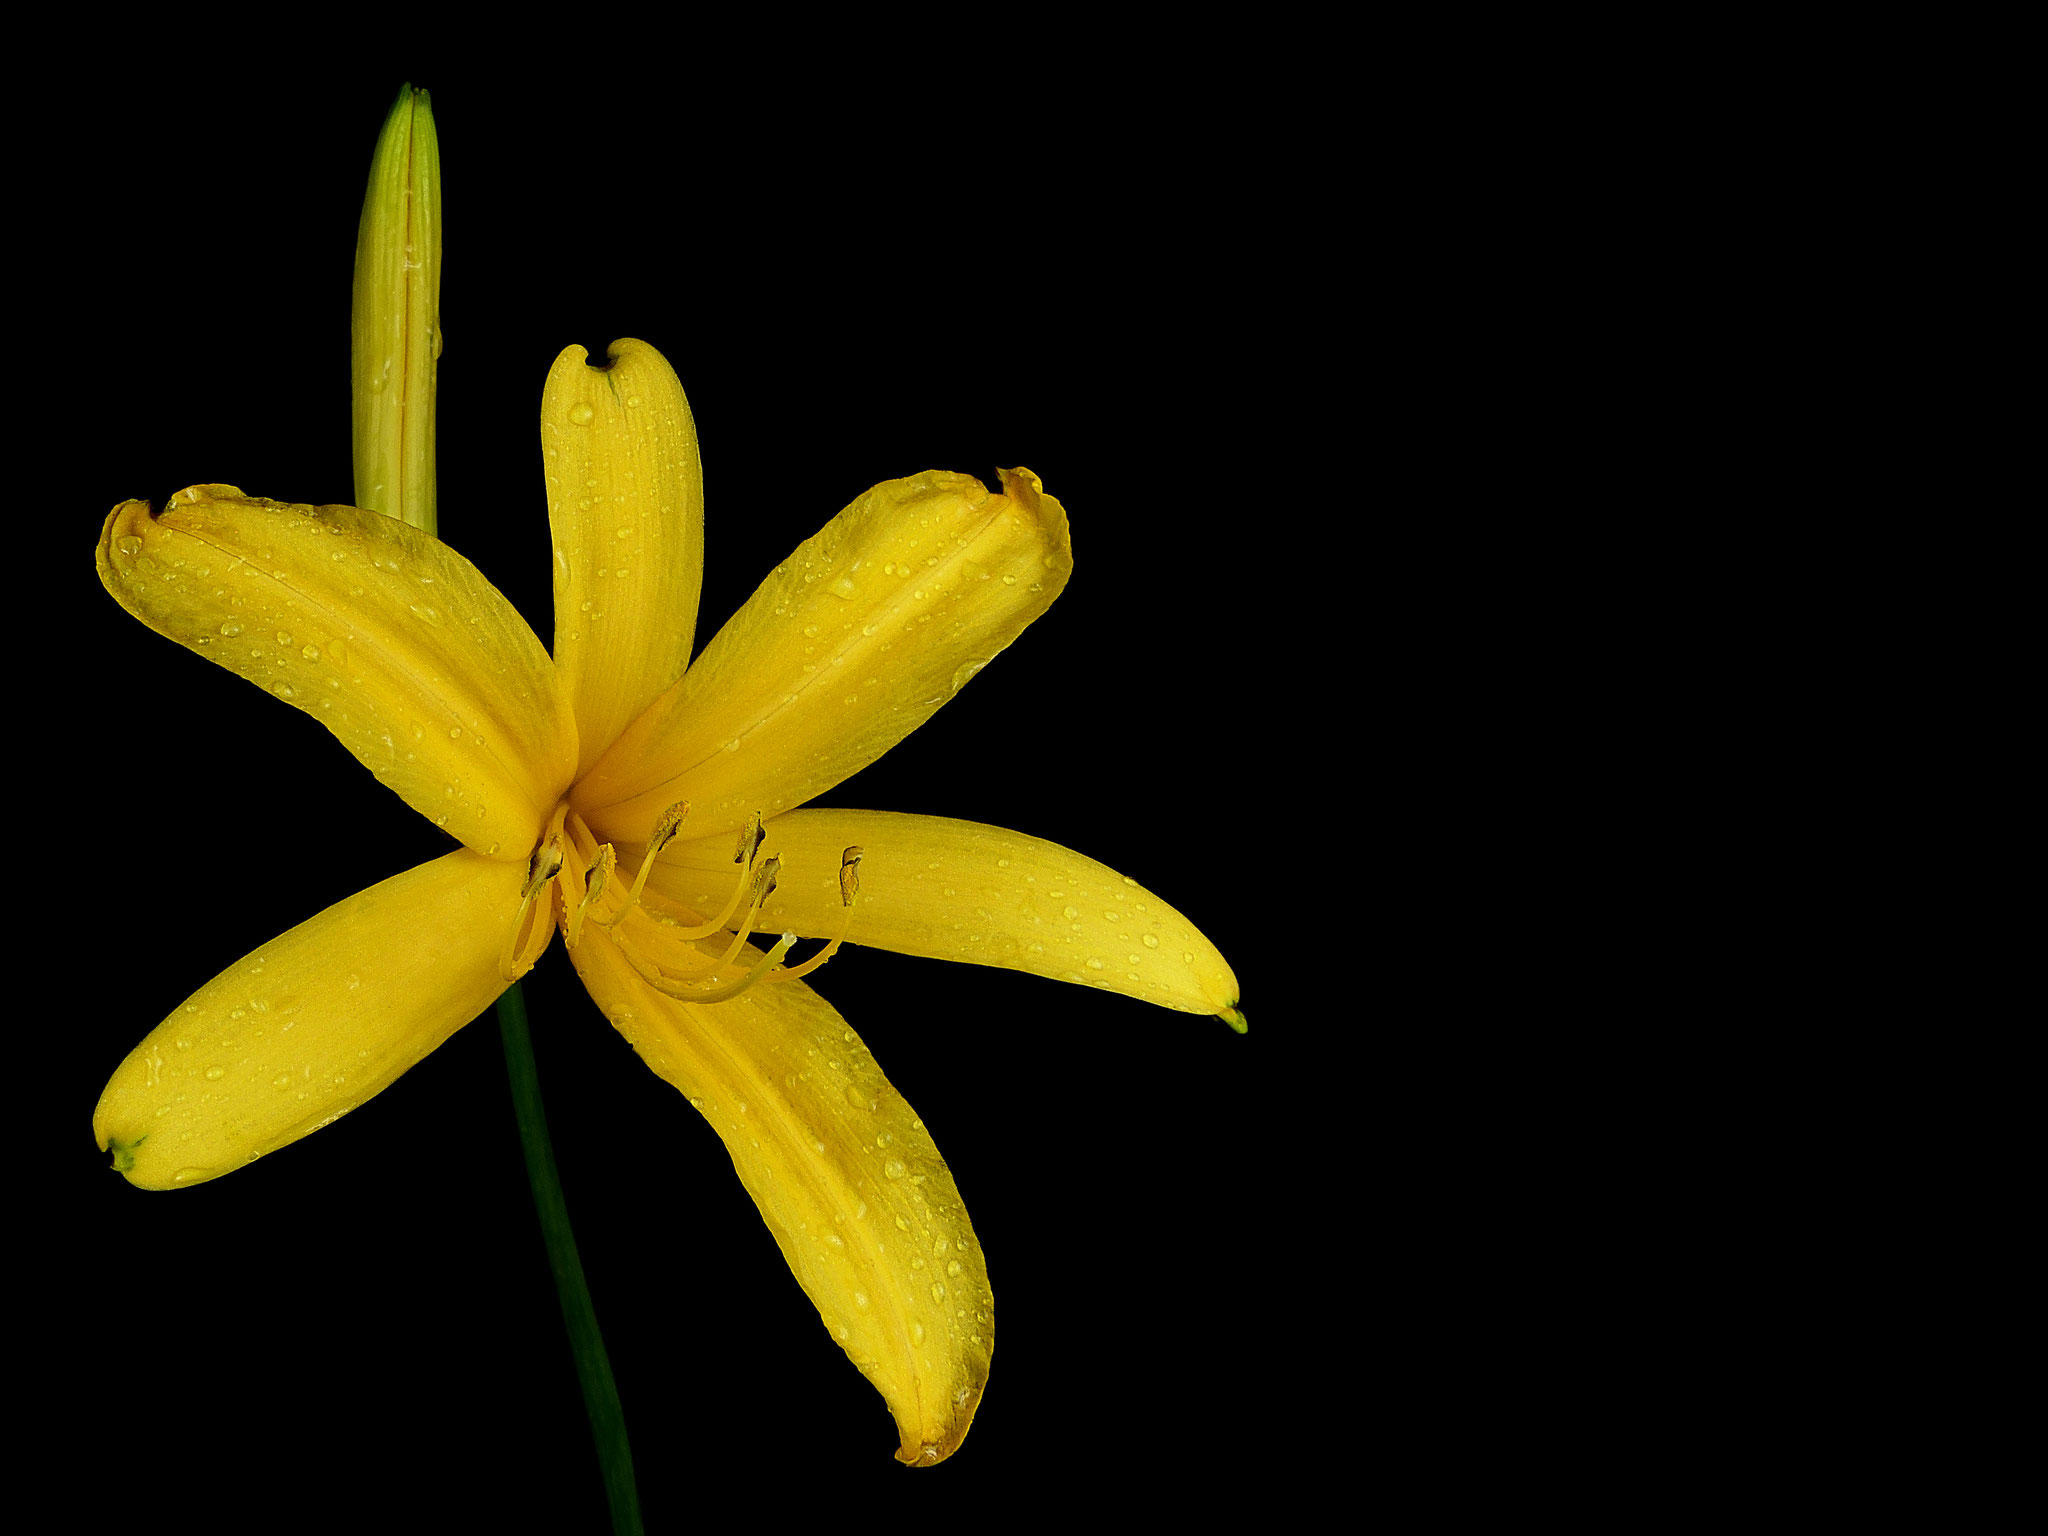 Hemerocallis middendorffii var. exaltata - Syn. Hemerocallis exaltata